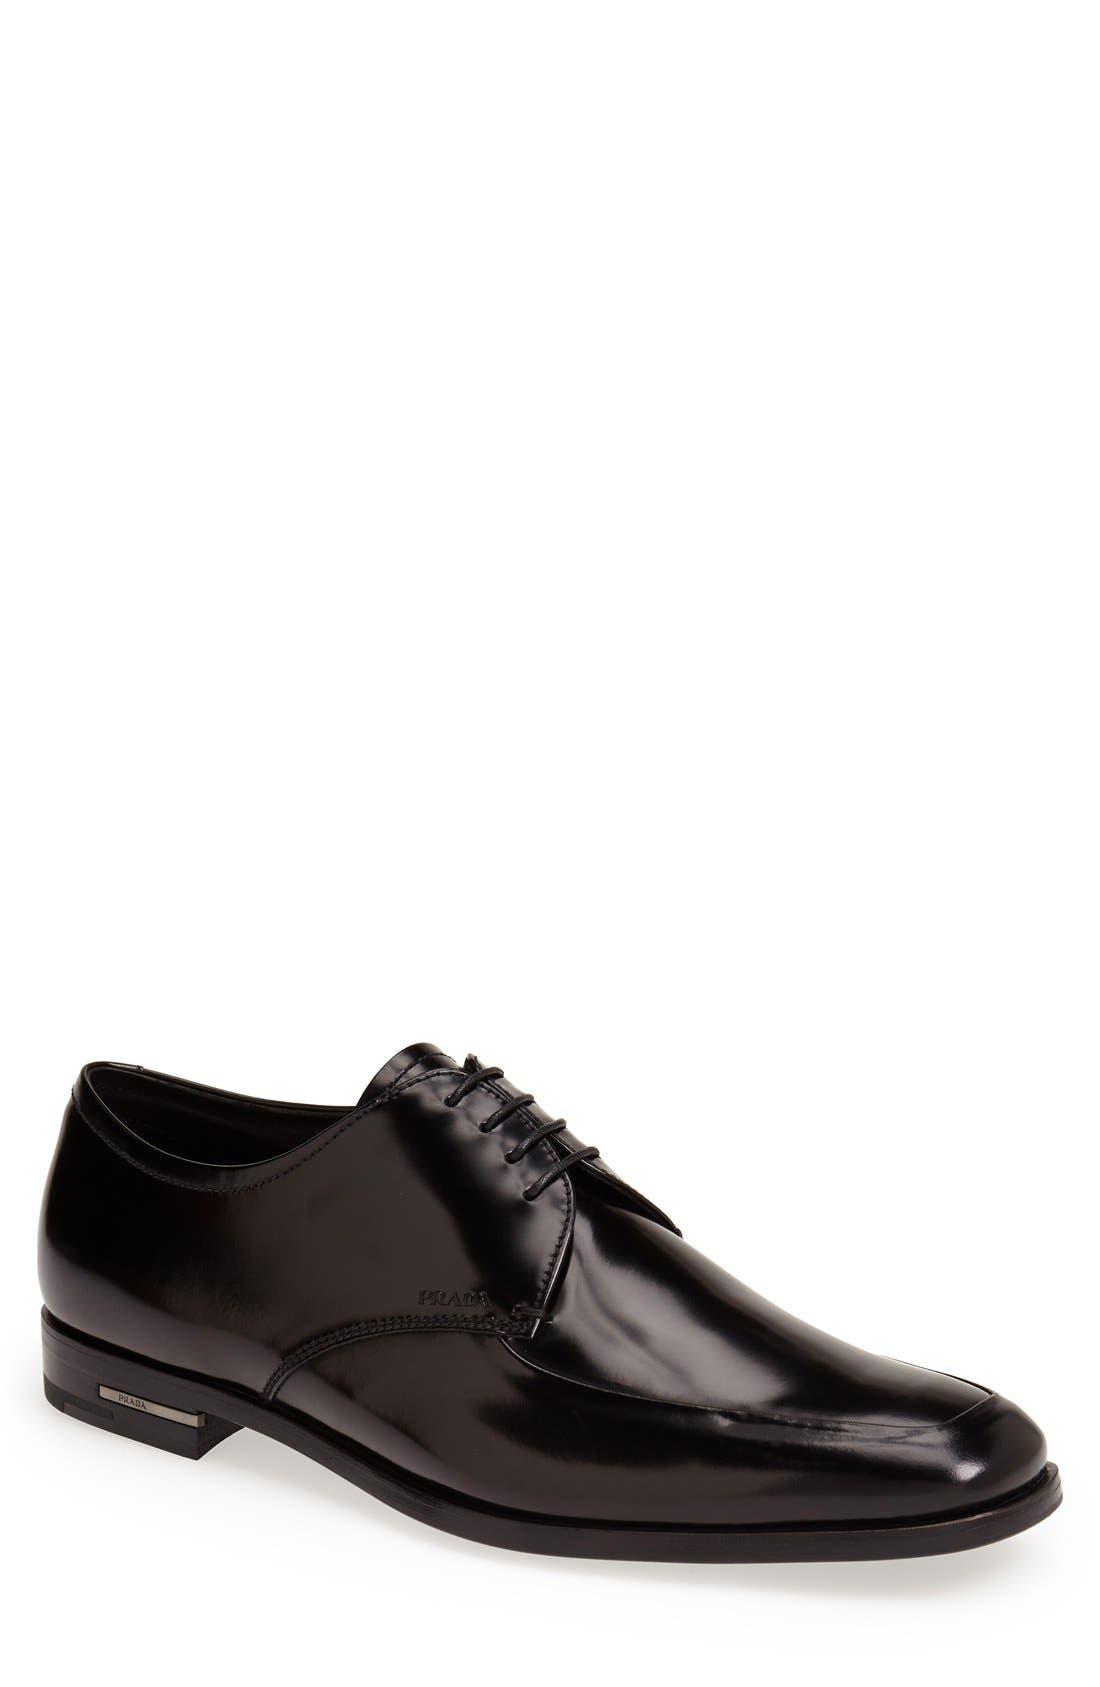 Alternate Image 1 Selected - Prada High Shine Apron Toe Oxford (Men)